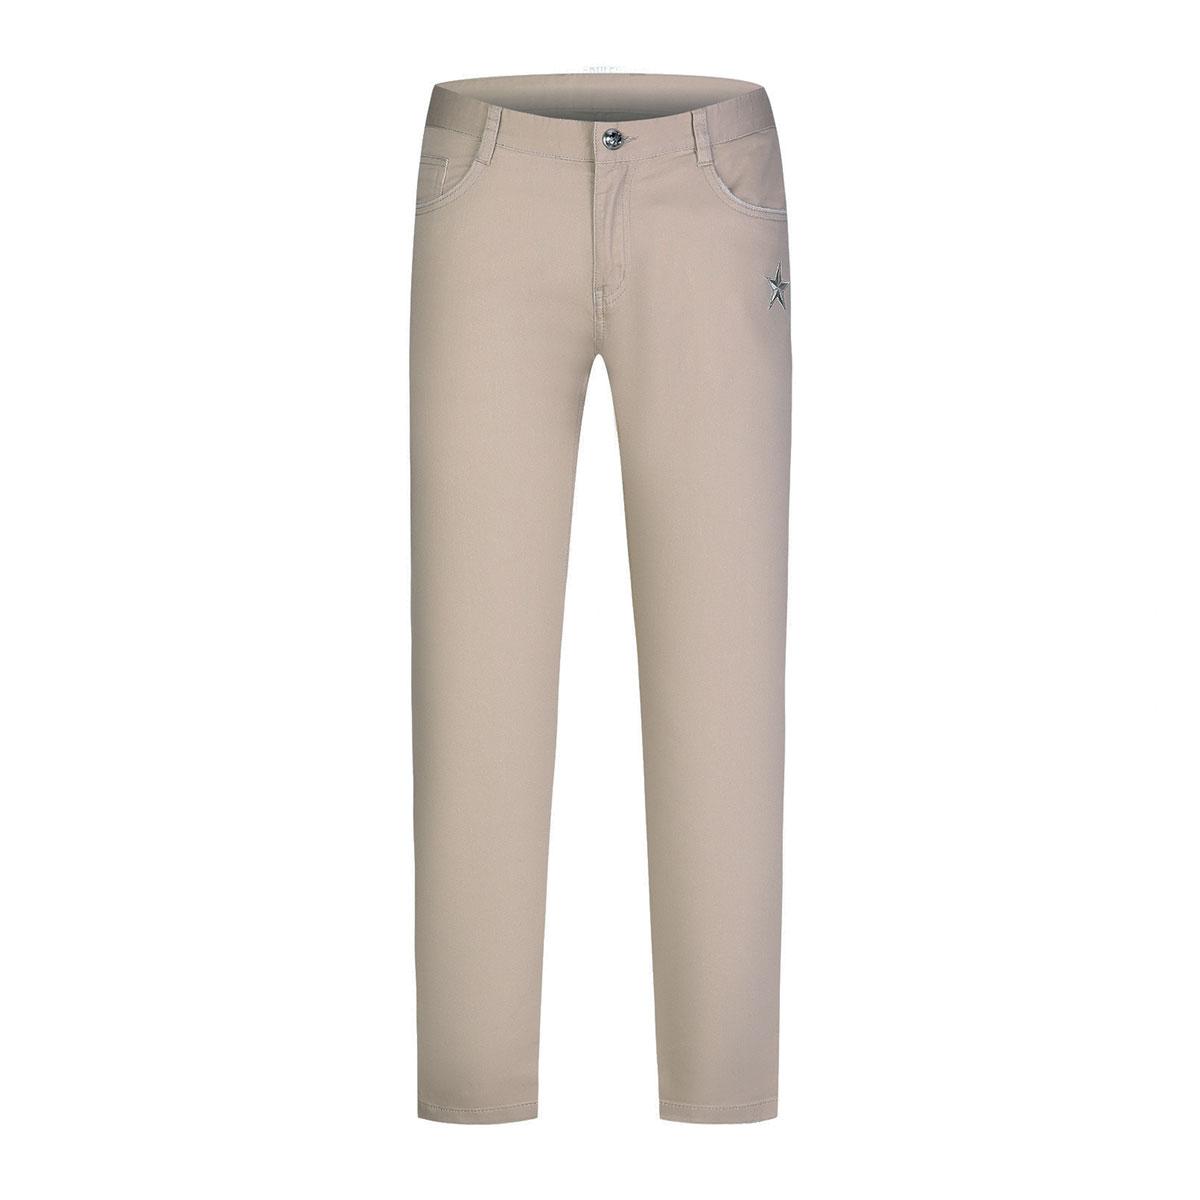 MANGANO长裤薄款透气裤子口袋纯色休闲运动裤151222570